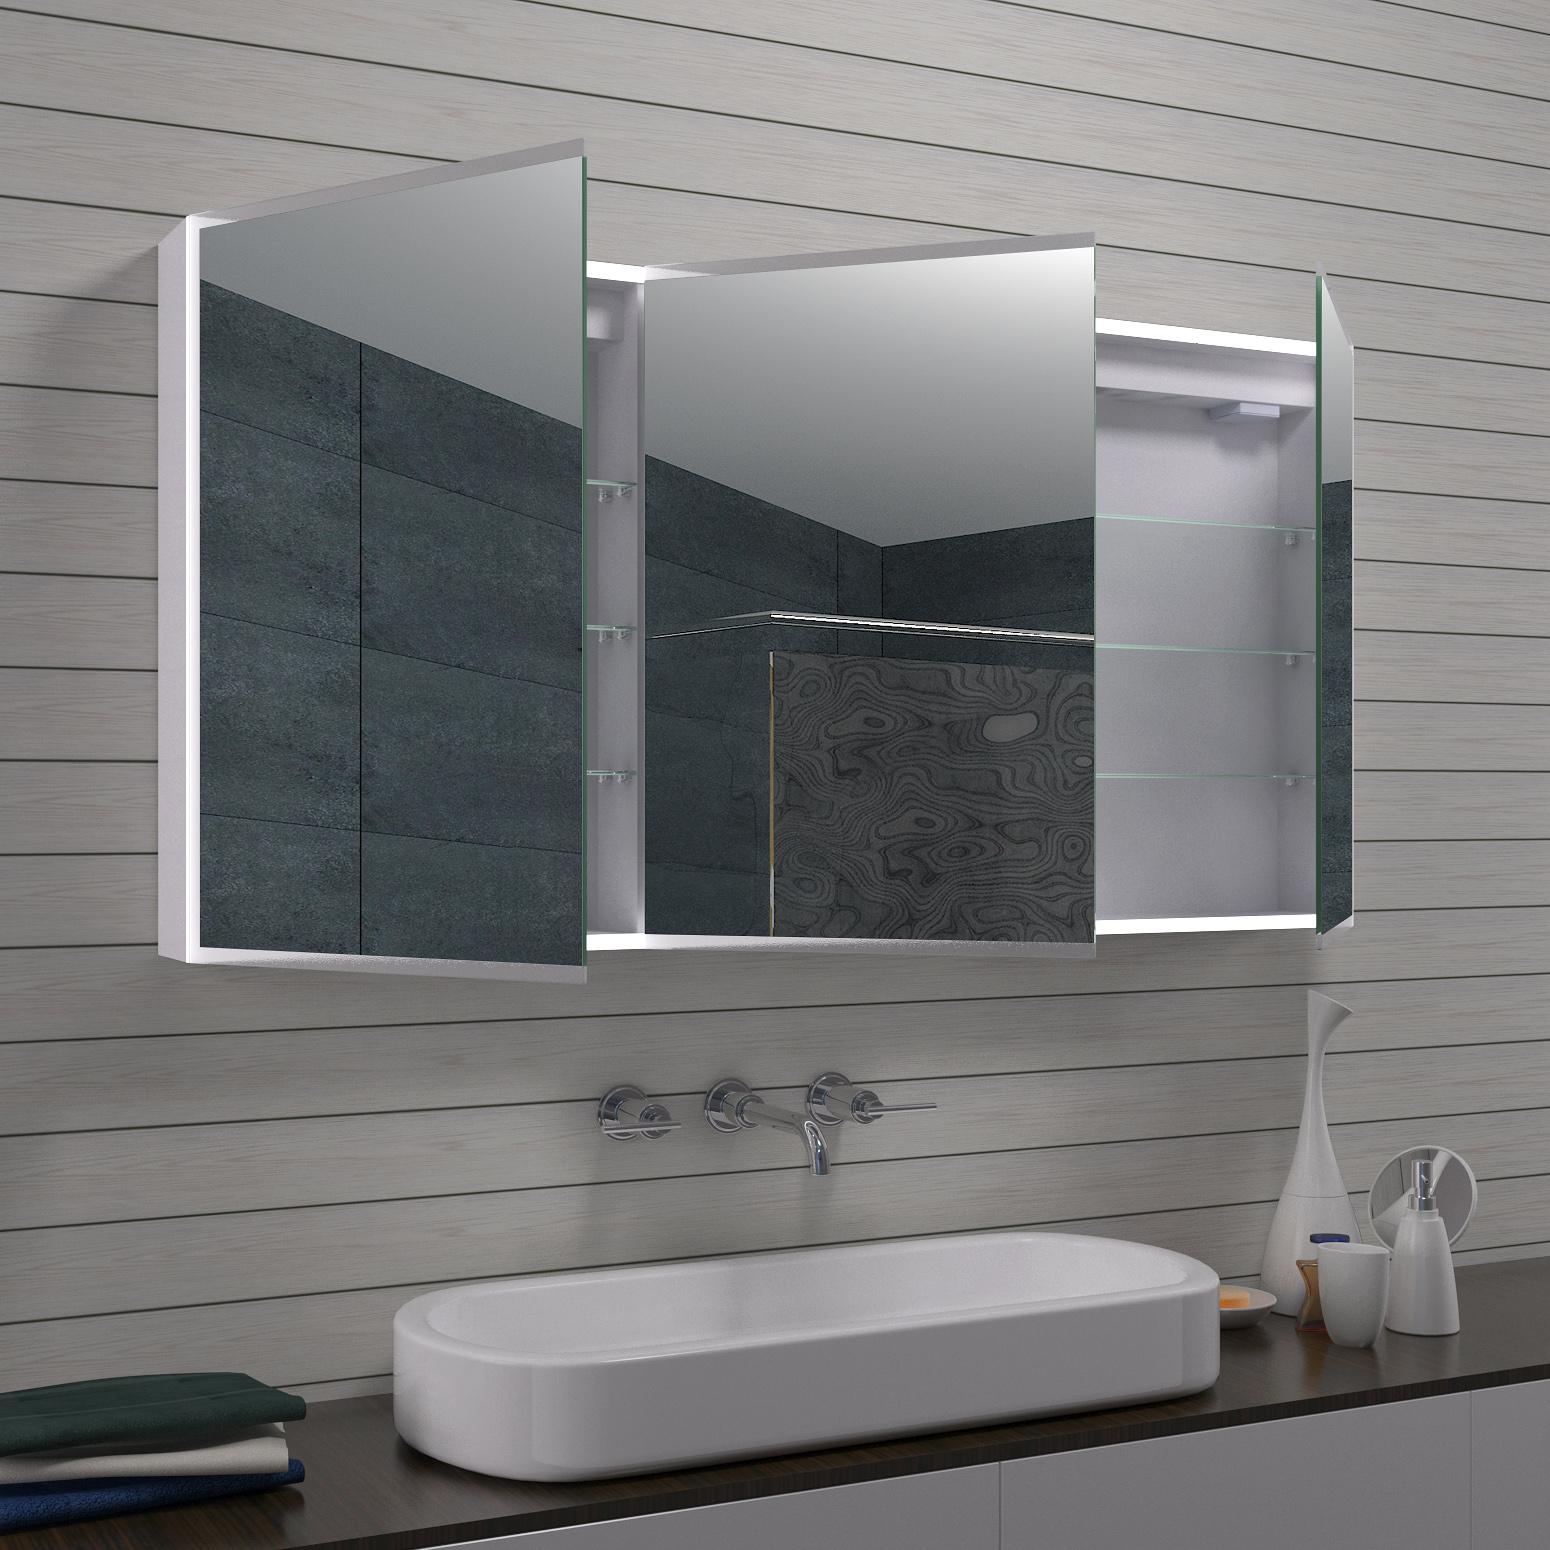 www.lux-aqua.de - Aluminium LED Beleuchtung Badezimmer